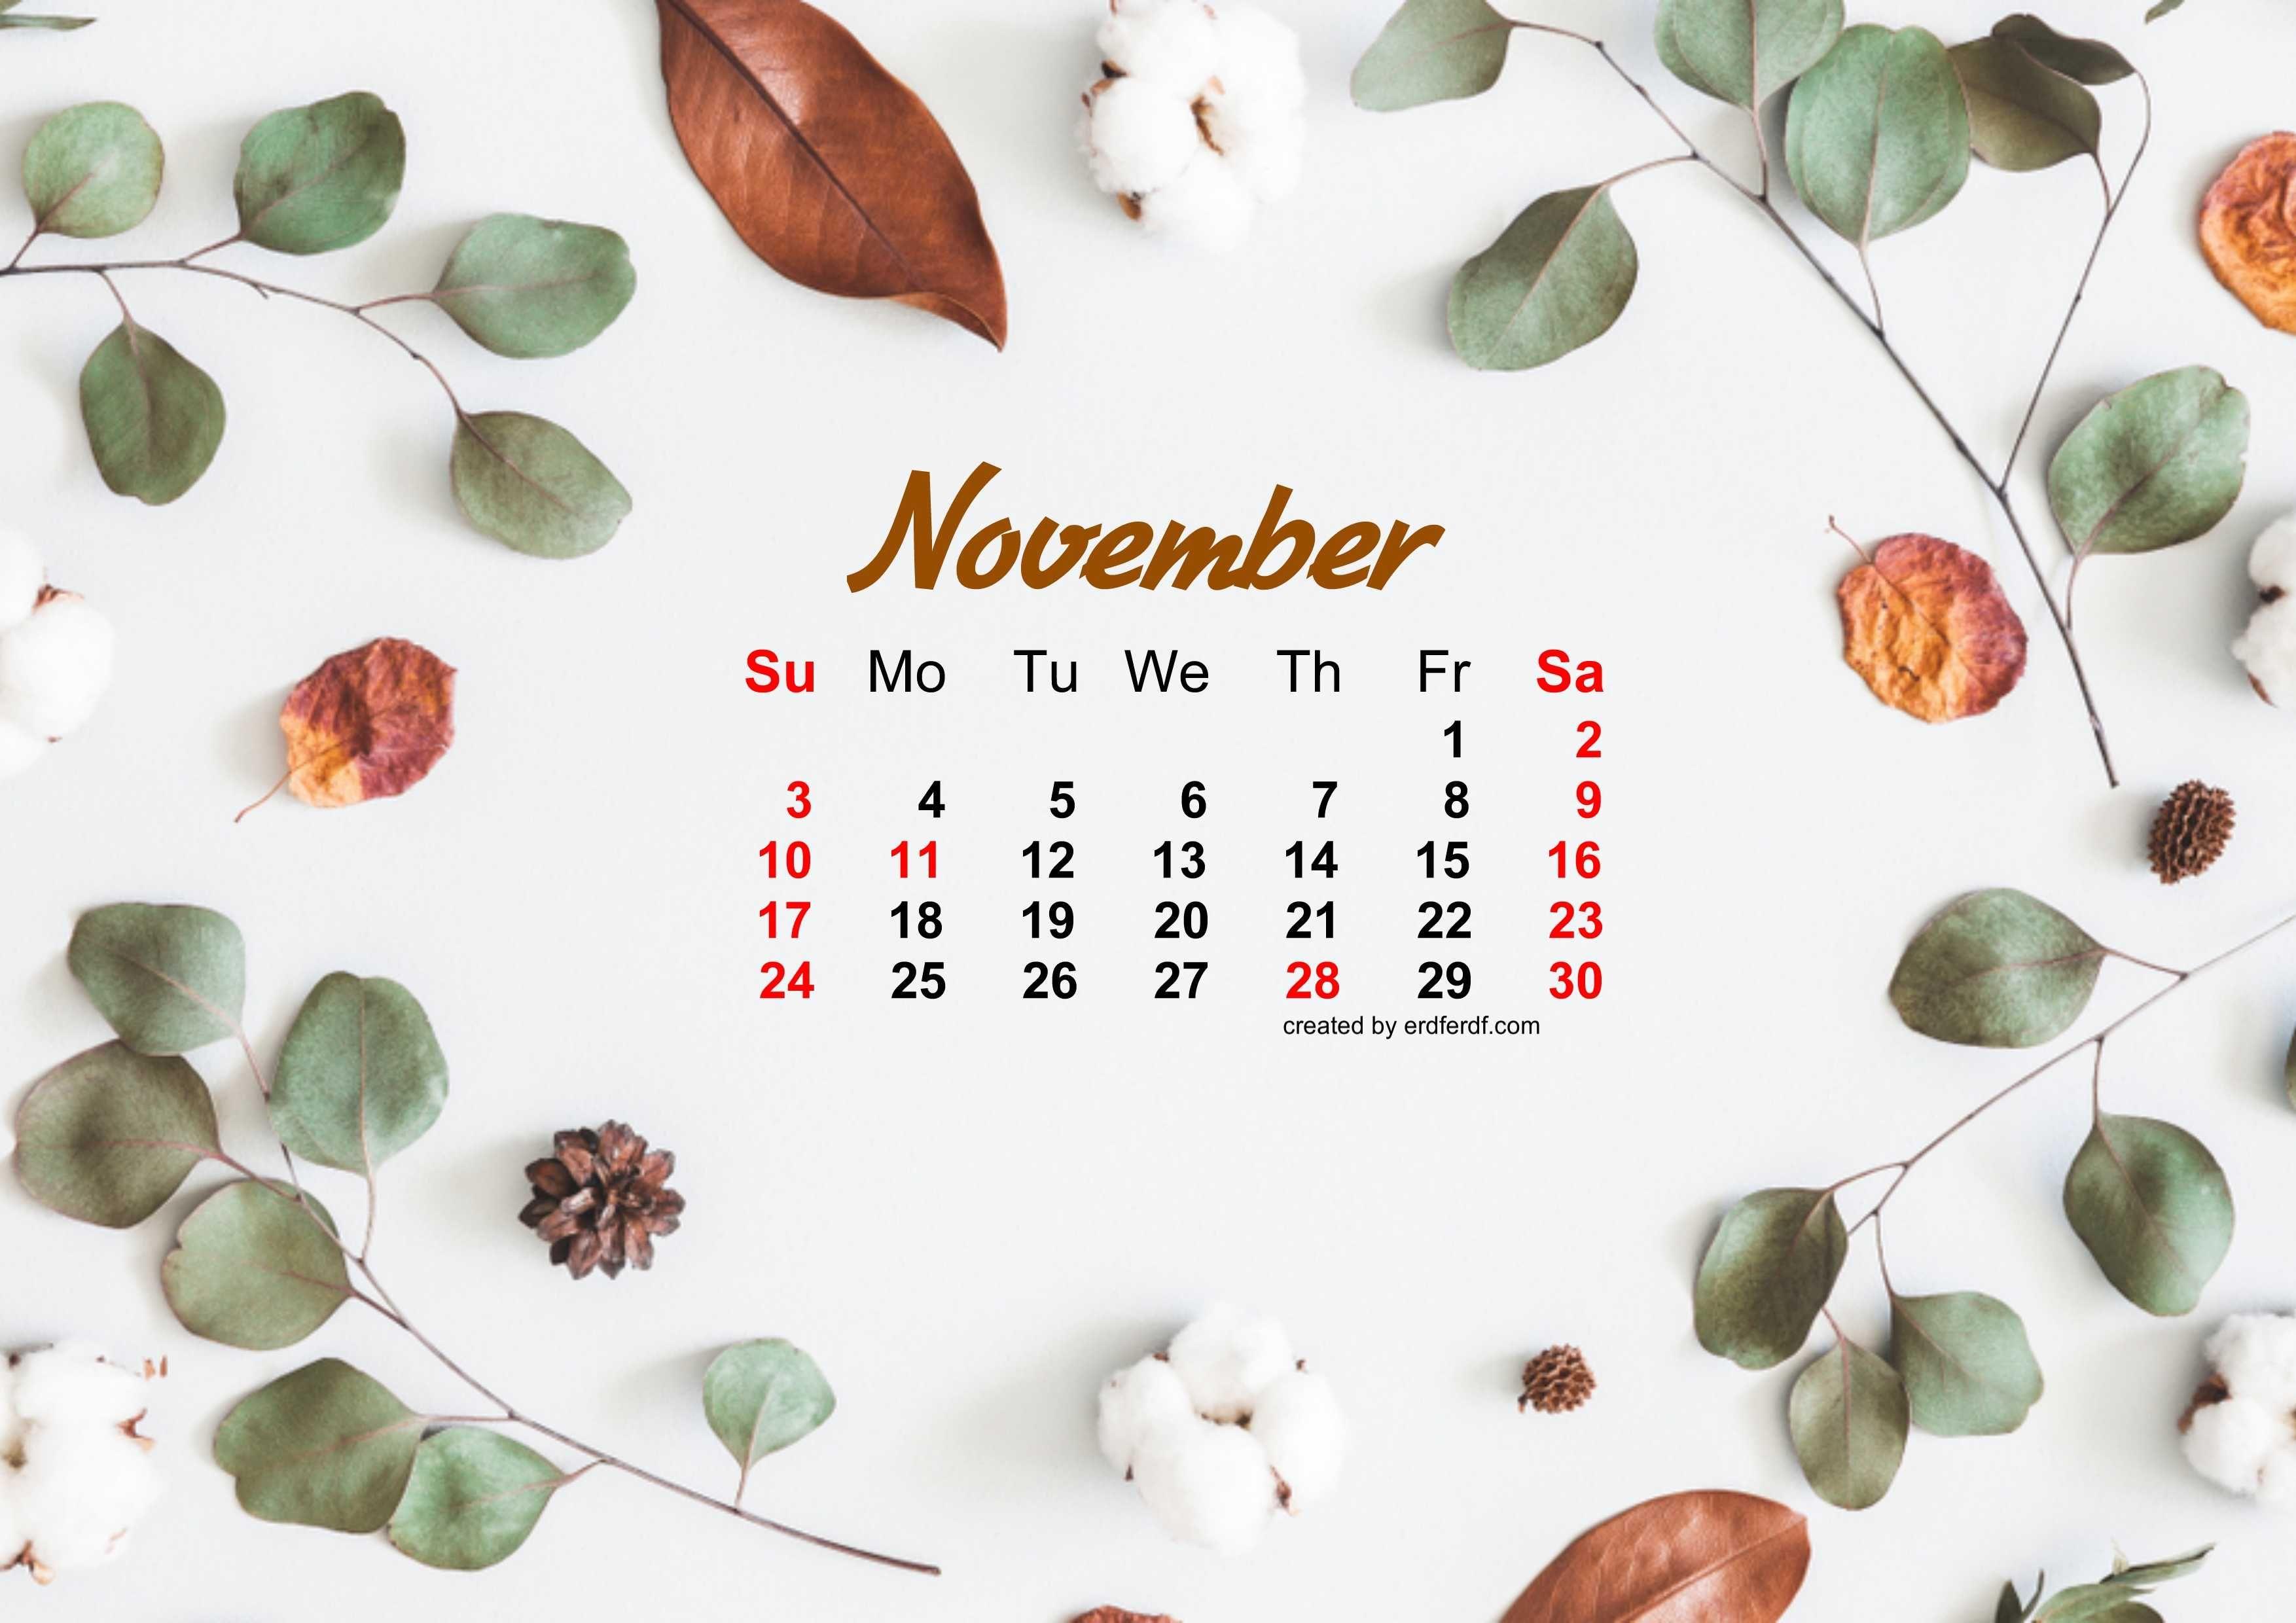 November 2019 Calendar Wallpaper Autum Dried Leaves